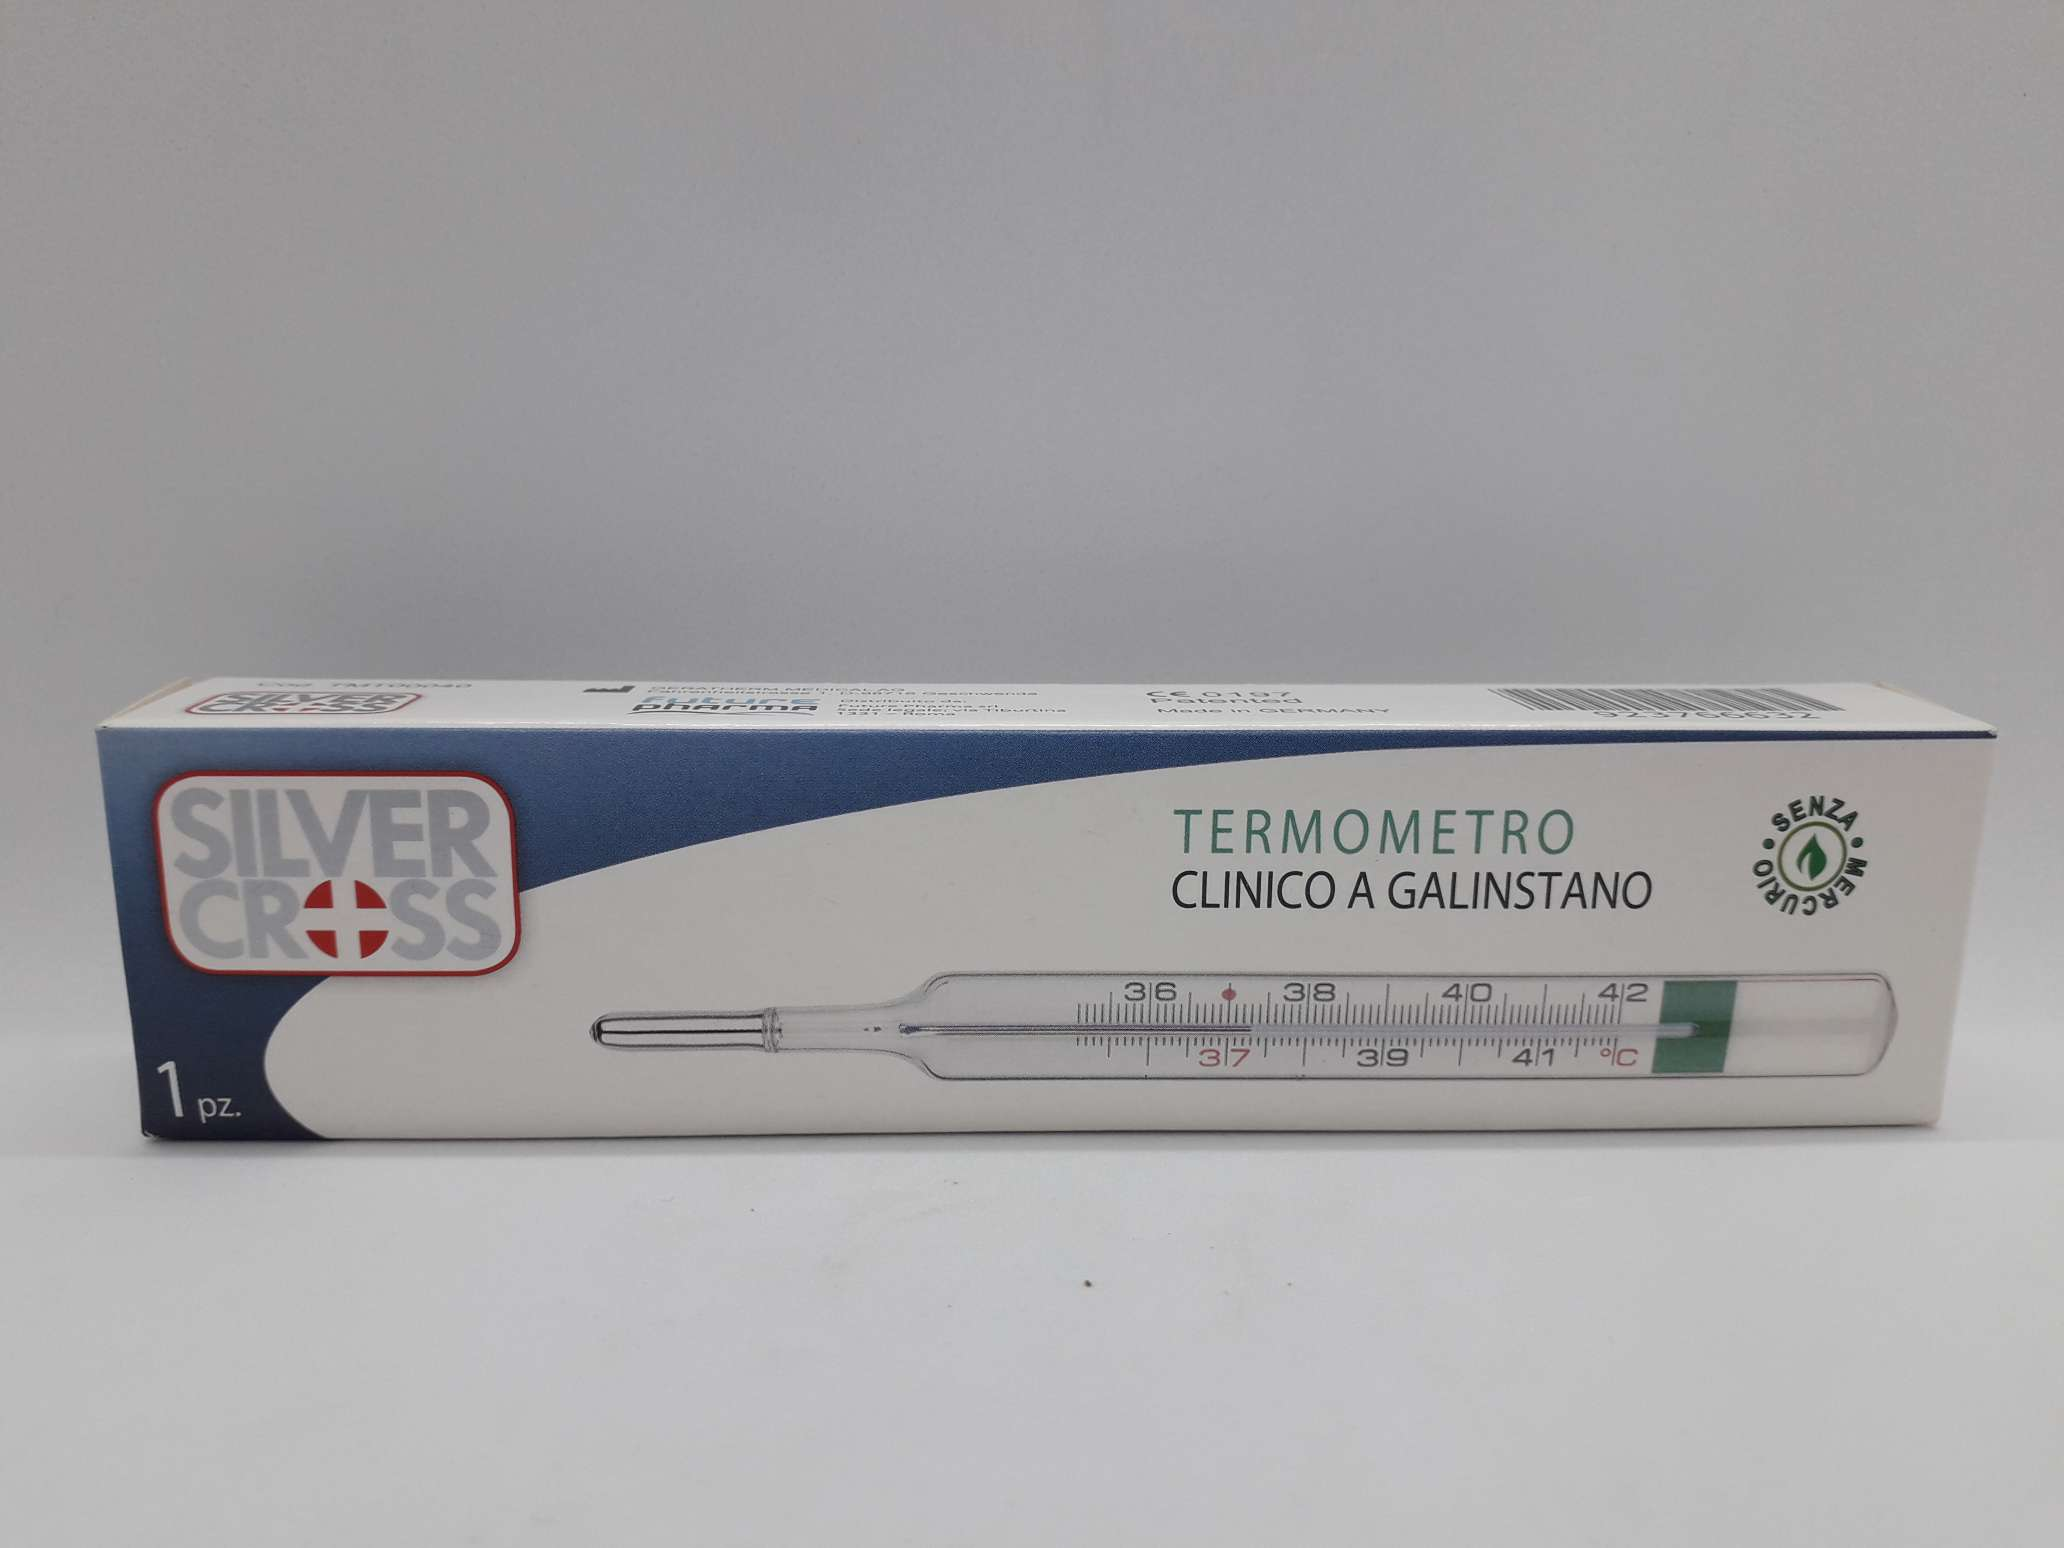 TERMOMETRO DIGITALE SILVER CROSS PUNTA RIGIDA - Farmaciaempatica.it